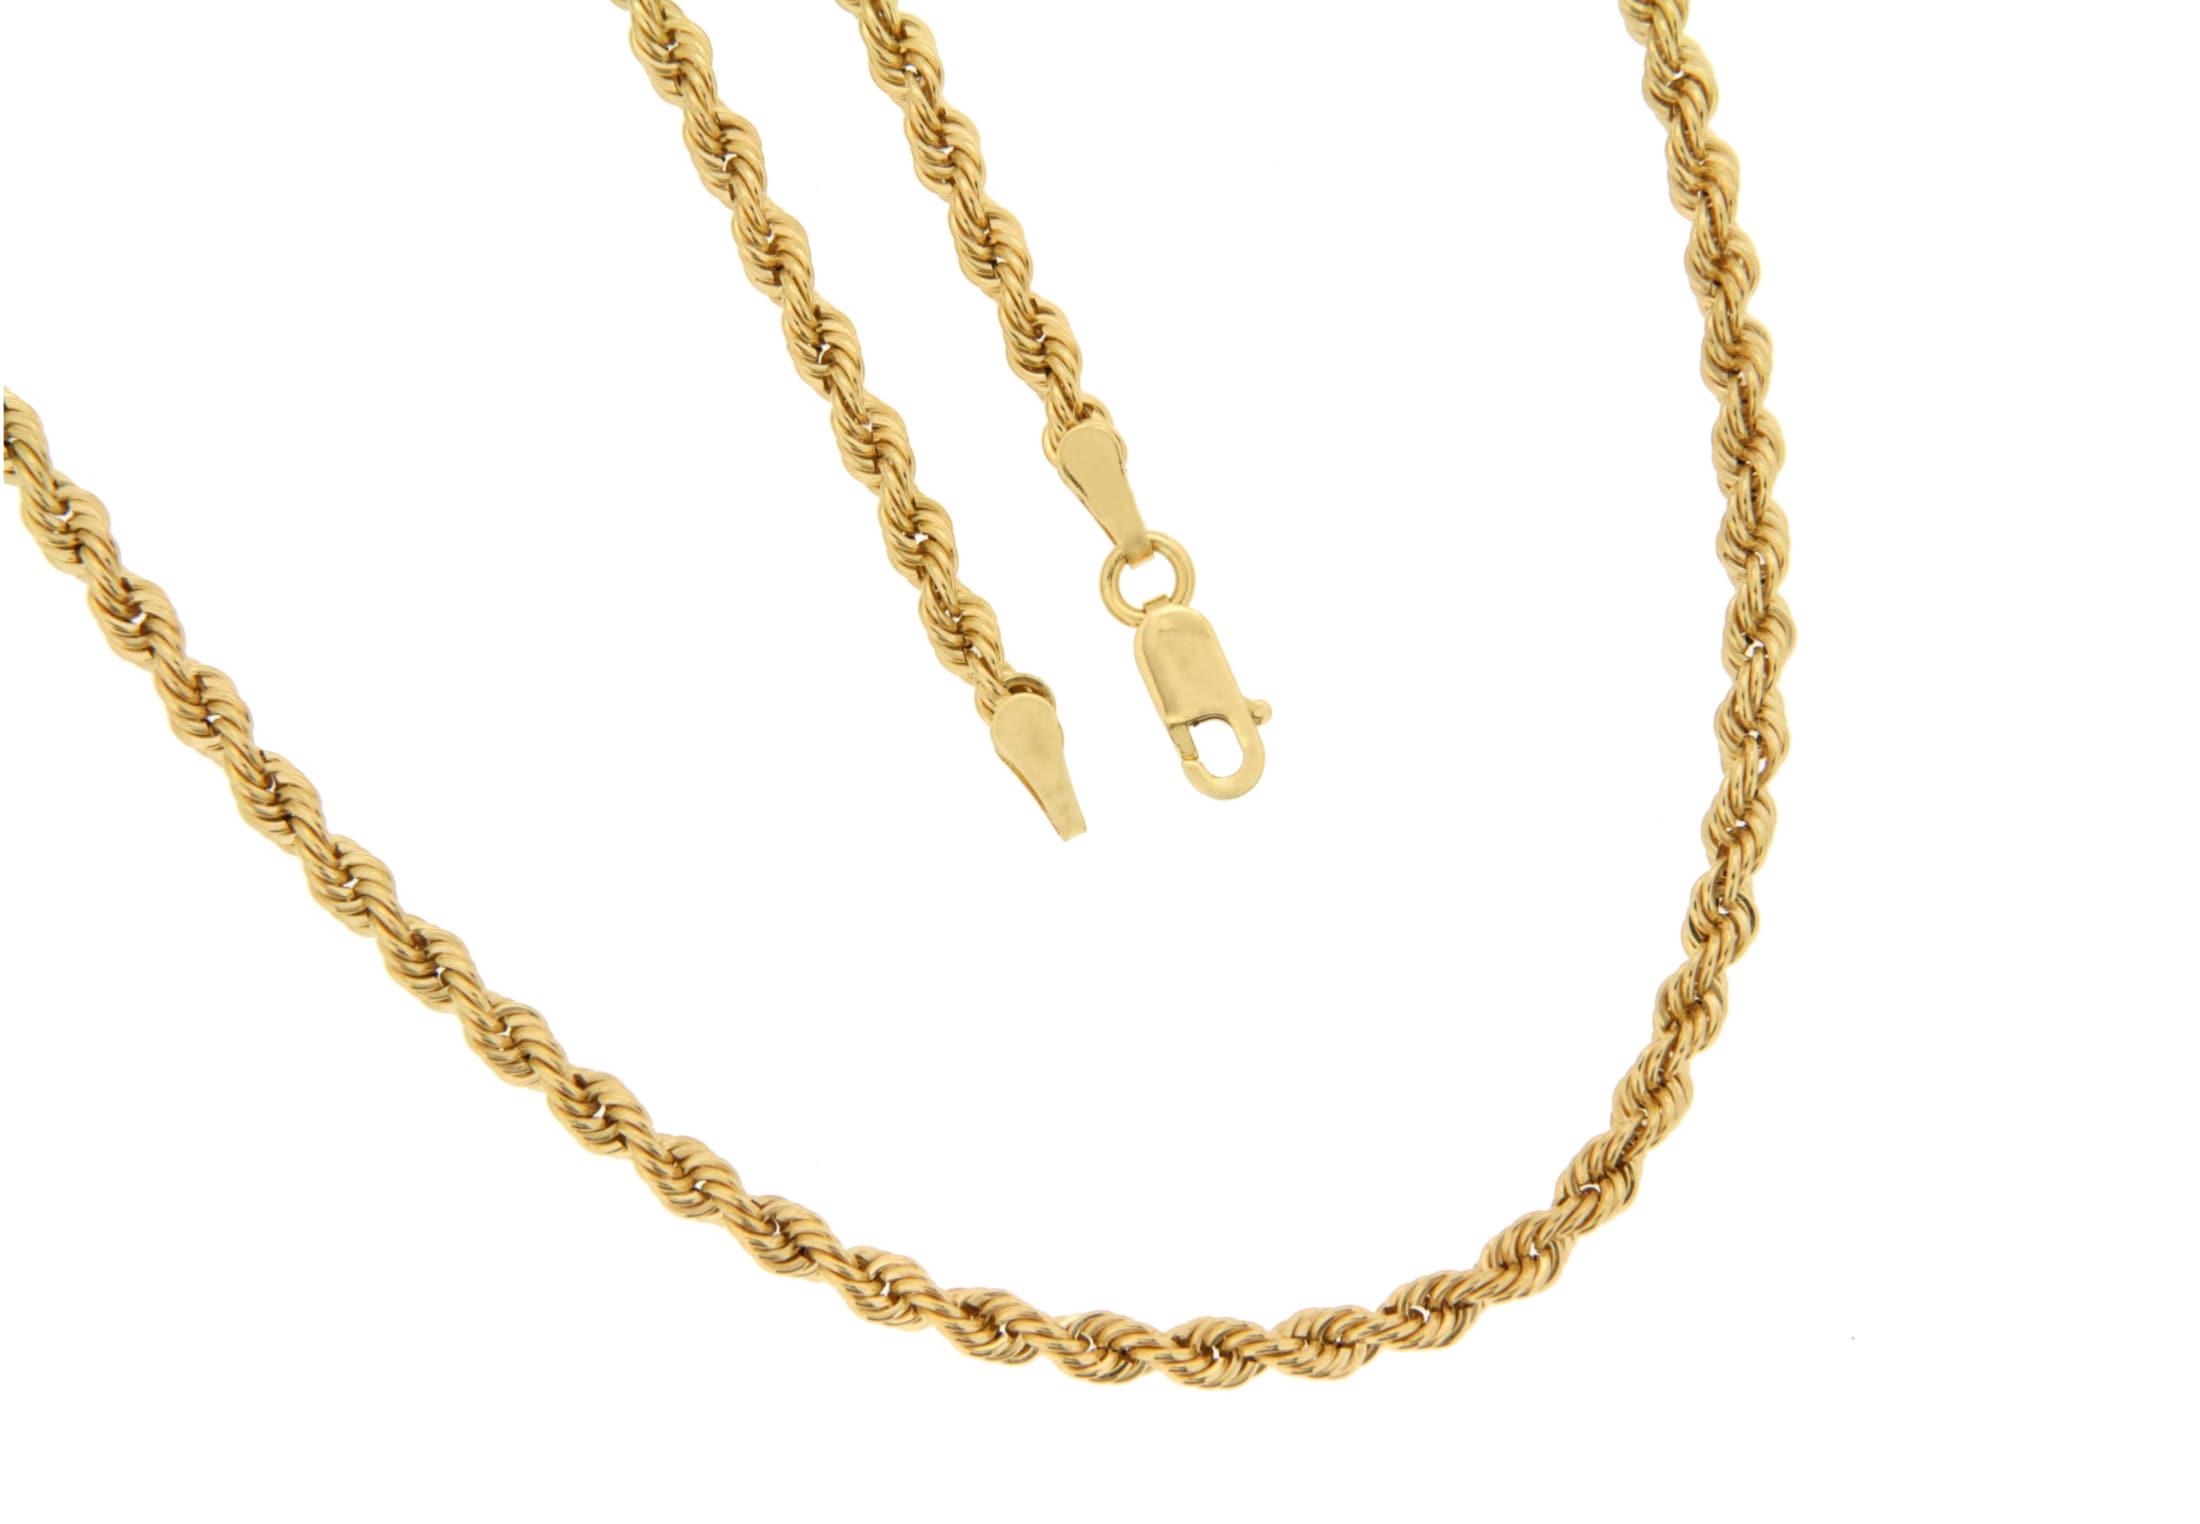 la piora -  Armband Kordel, glanz, halbmassiv, 585/- Gelbgold